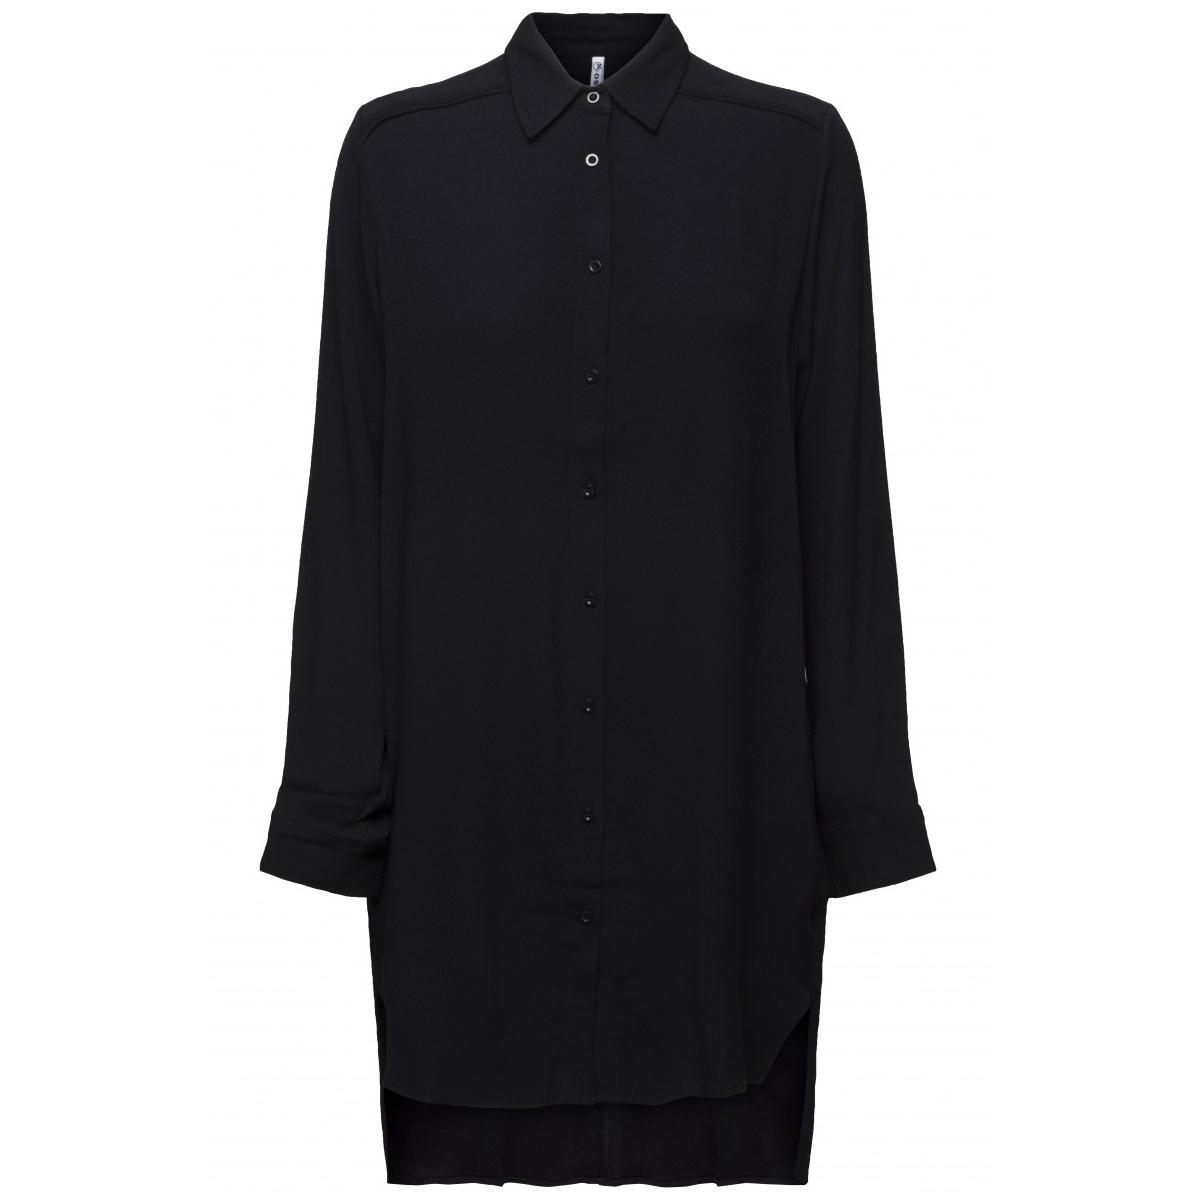 abby crepe long blouse 194 zoso tuniek black